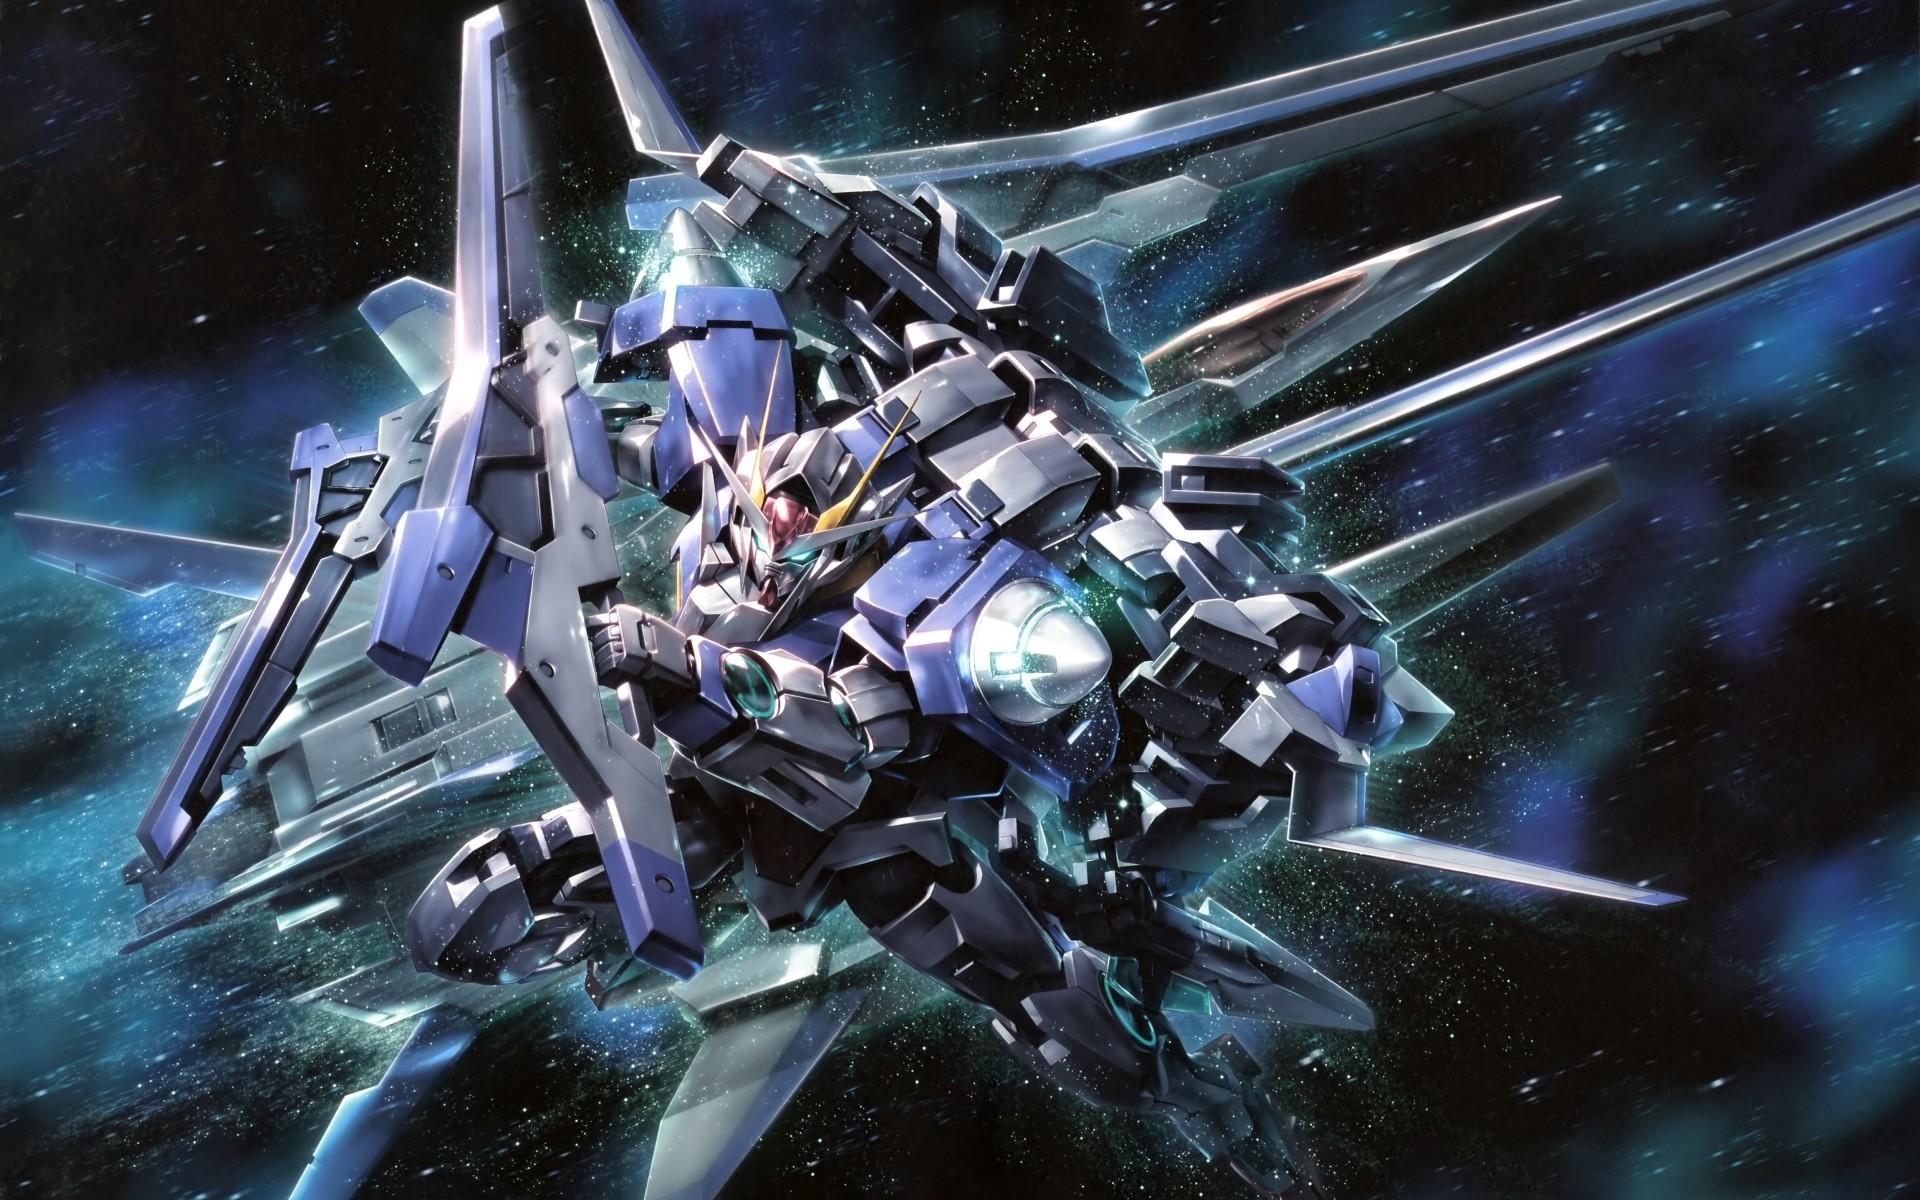 Gundam Wing Deathscythe Wallpaper 74 images 1920x1200